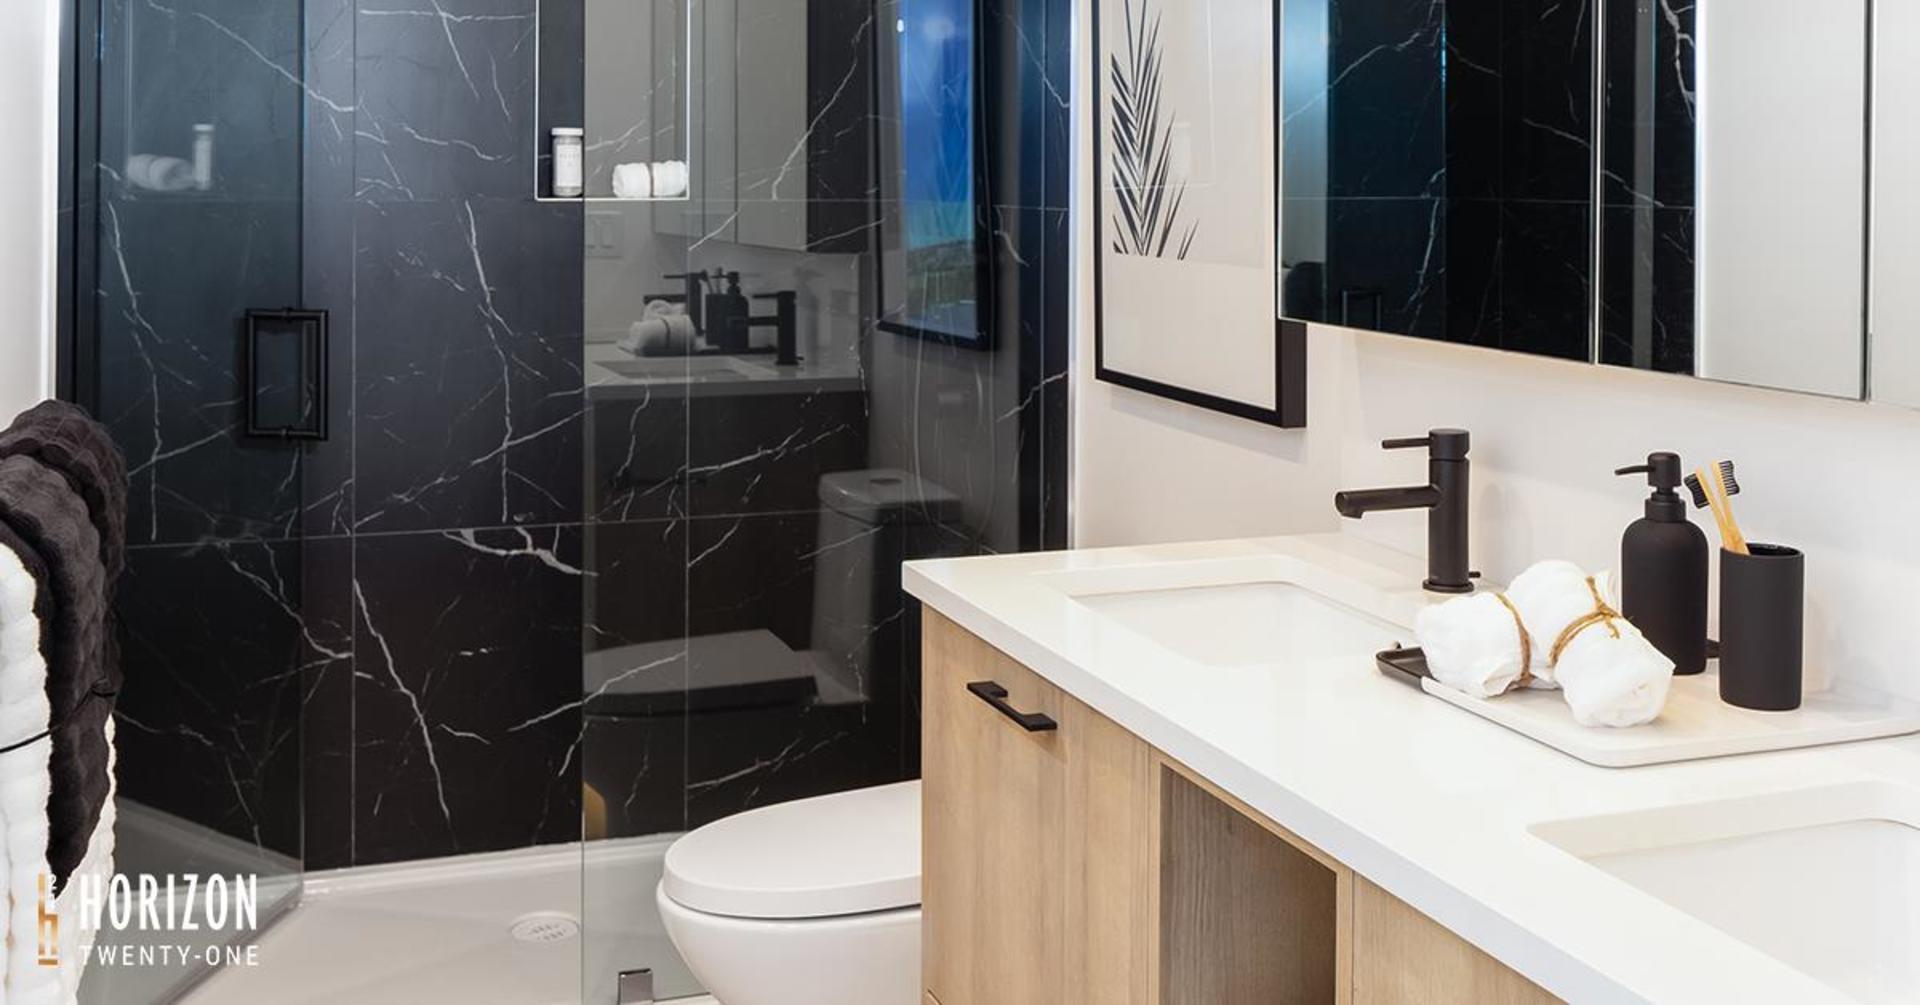 horizon-21-bathroom at Horizon 21 (218 Blue Mountain, Maillardville, Coquitlam)